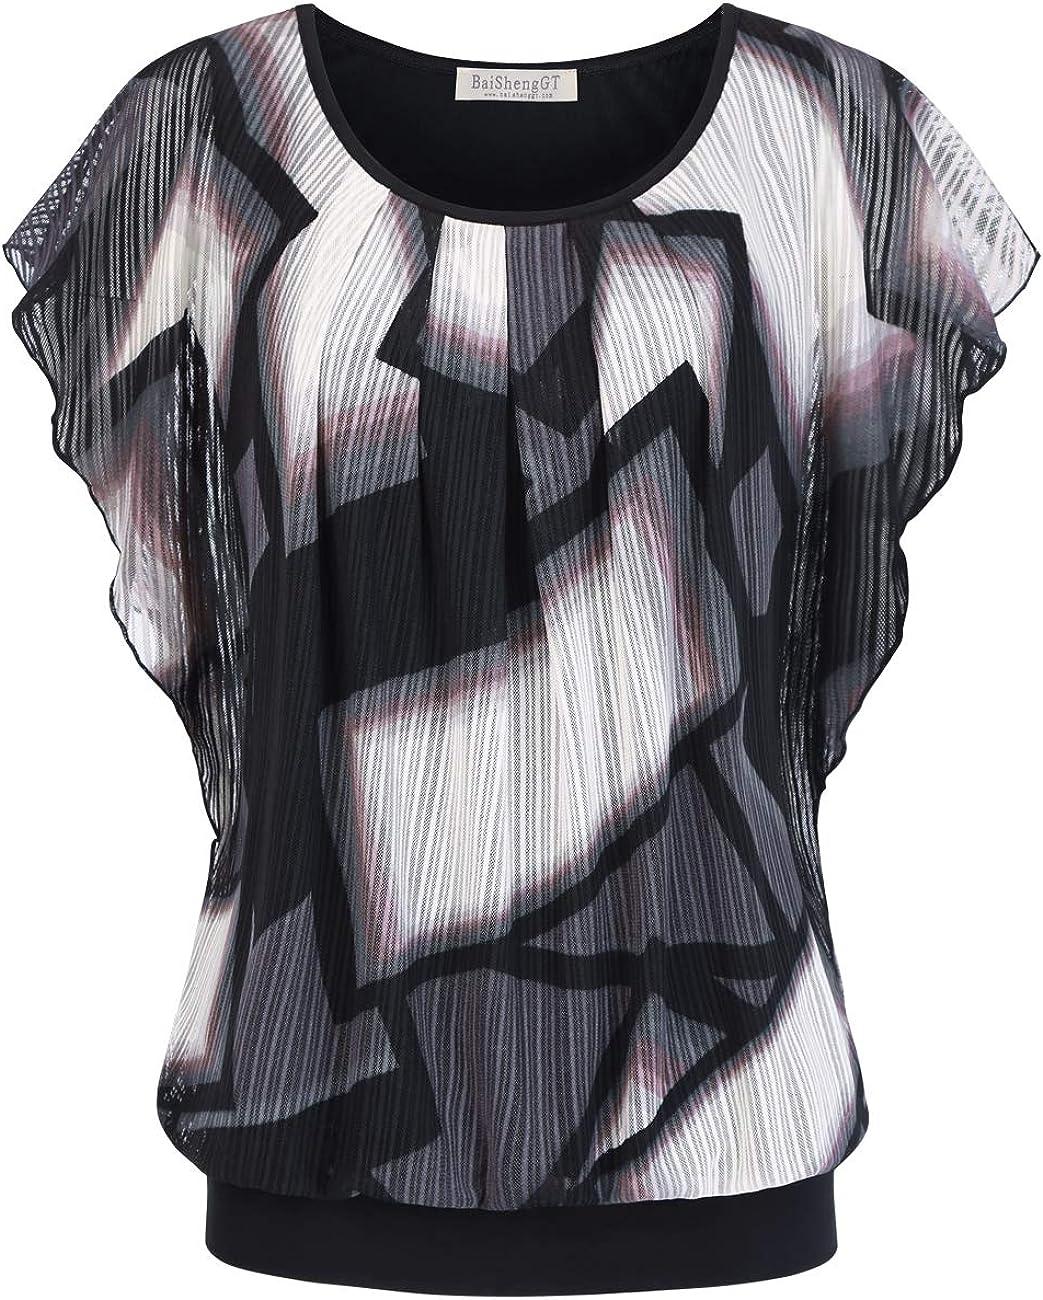 BAISHENGGT Women's Printed Flouncing Flared Short Sleeve Mesh Blouse Top